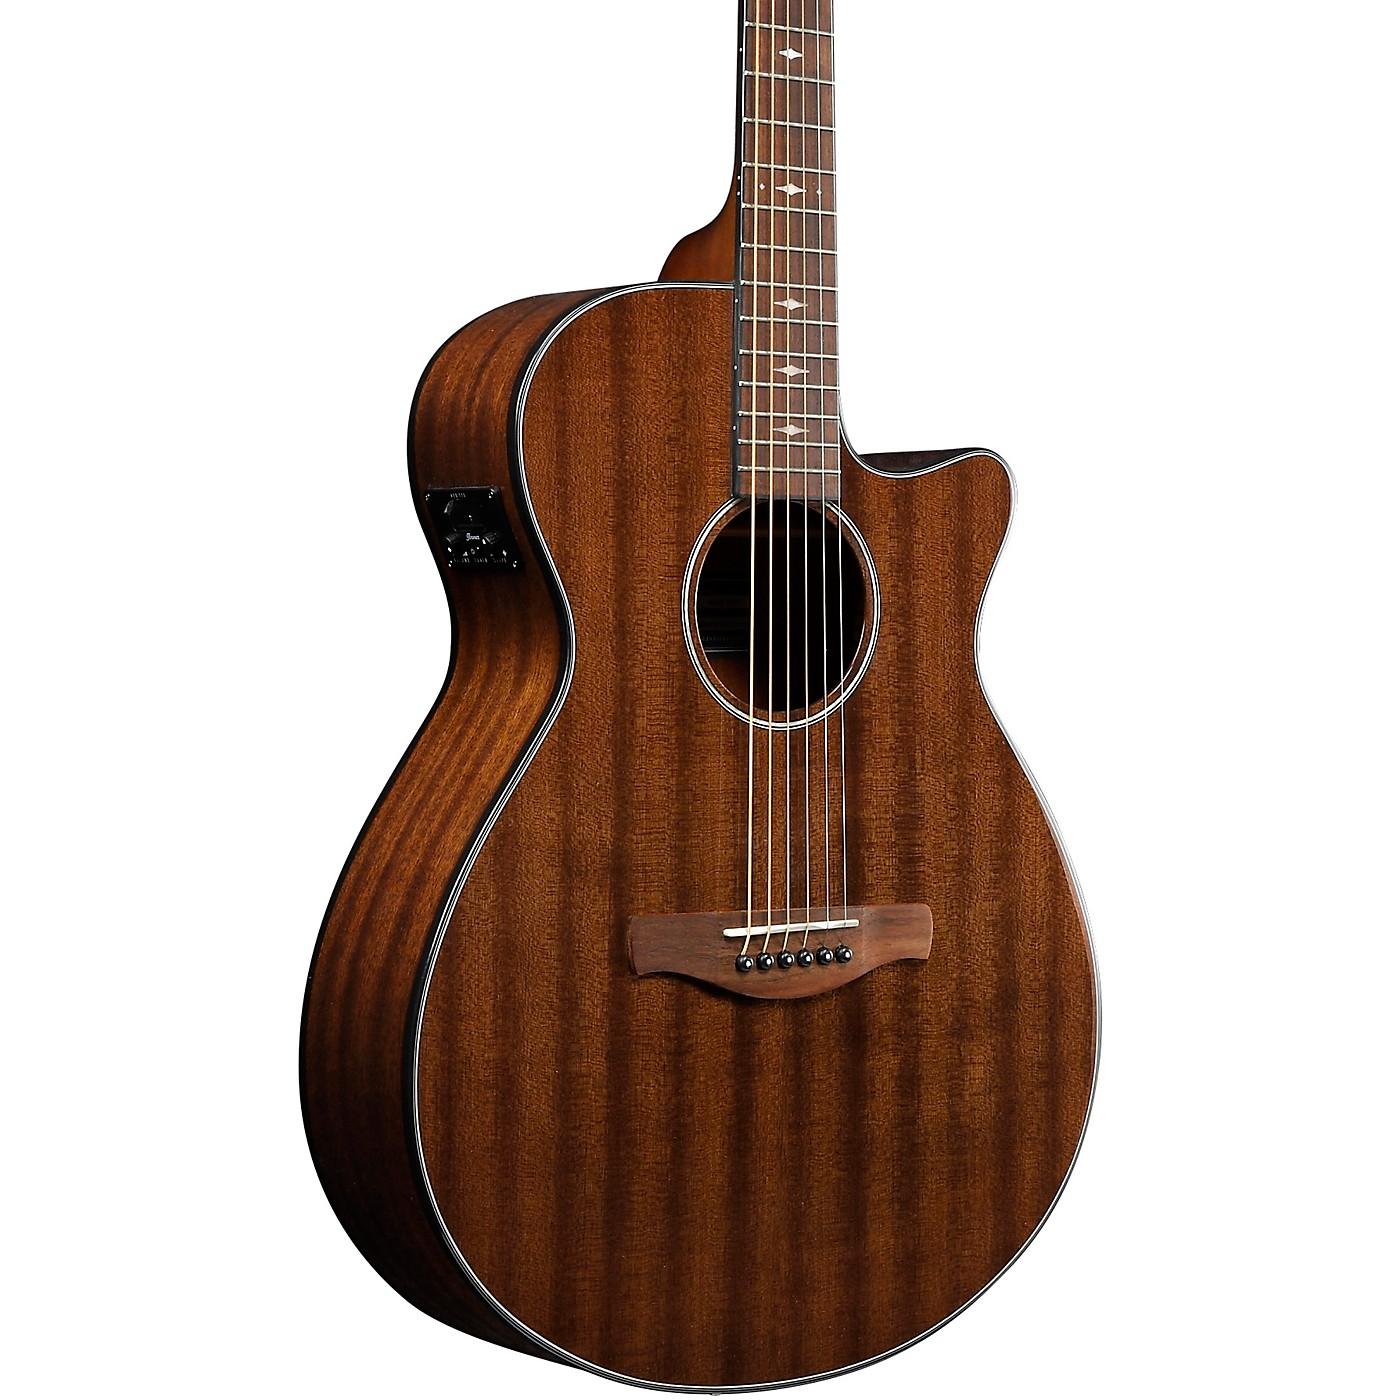 Ibanez AEG62 Grand Concert Acoustic-Electric Guitar thumbnail